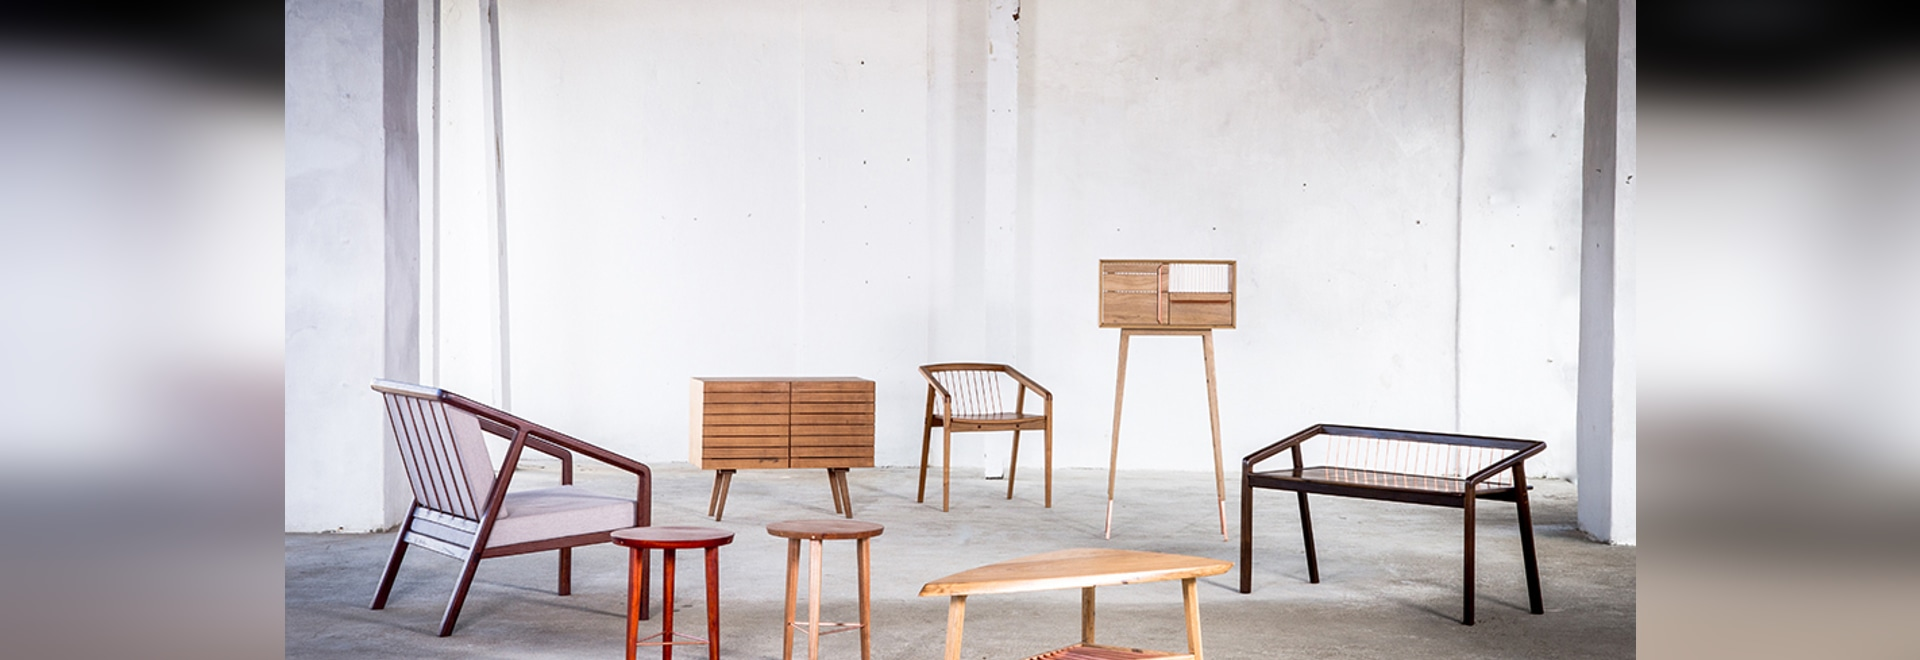 Muebles brasileños contemporáneos de Knót Artesanal